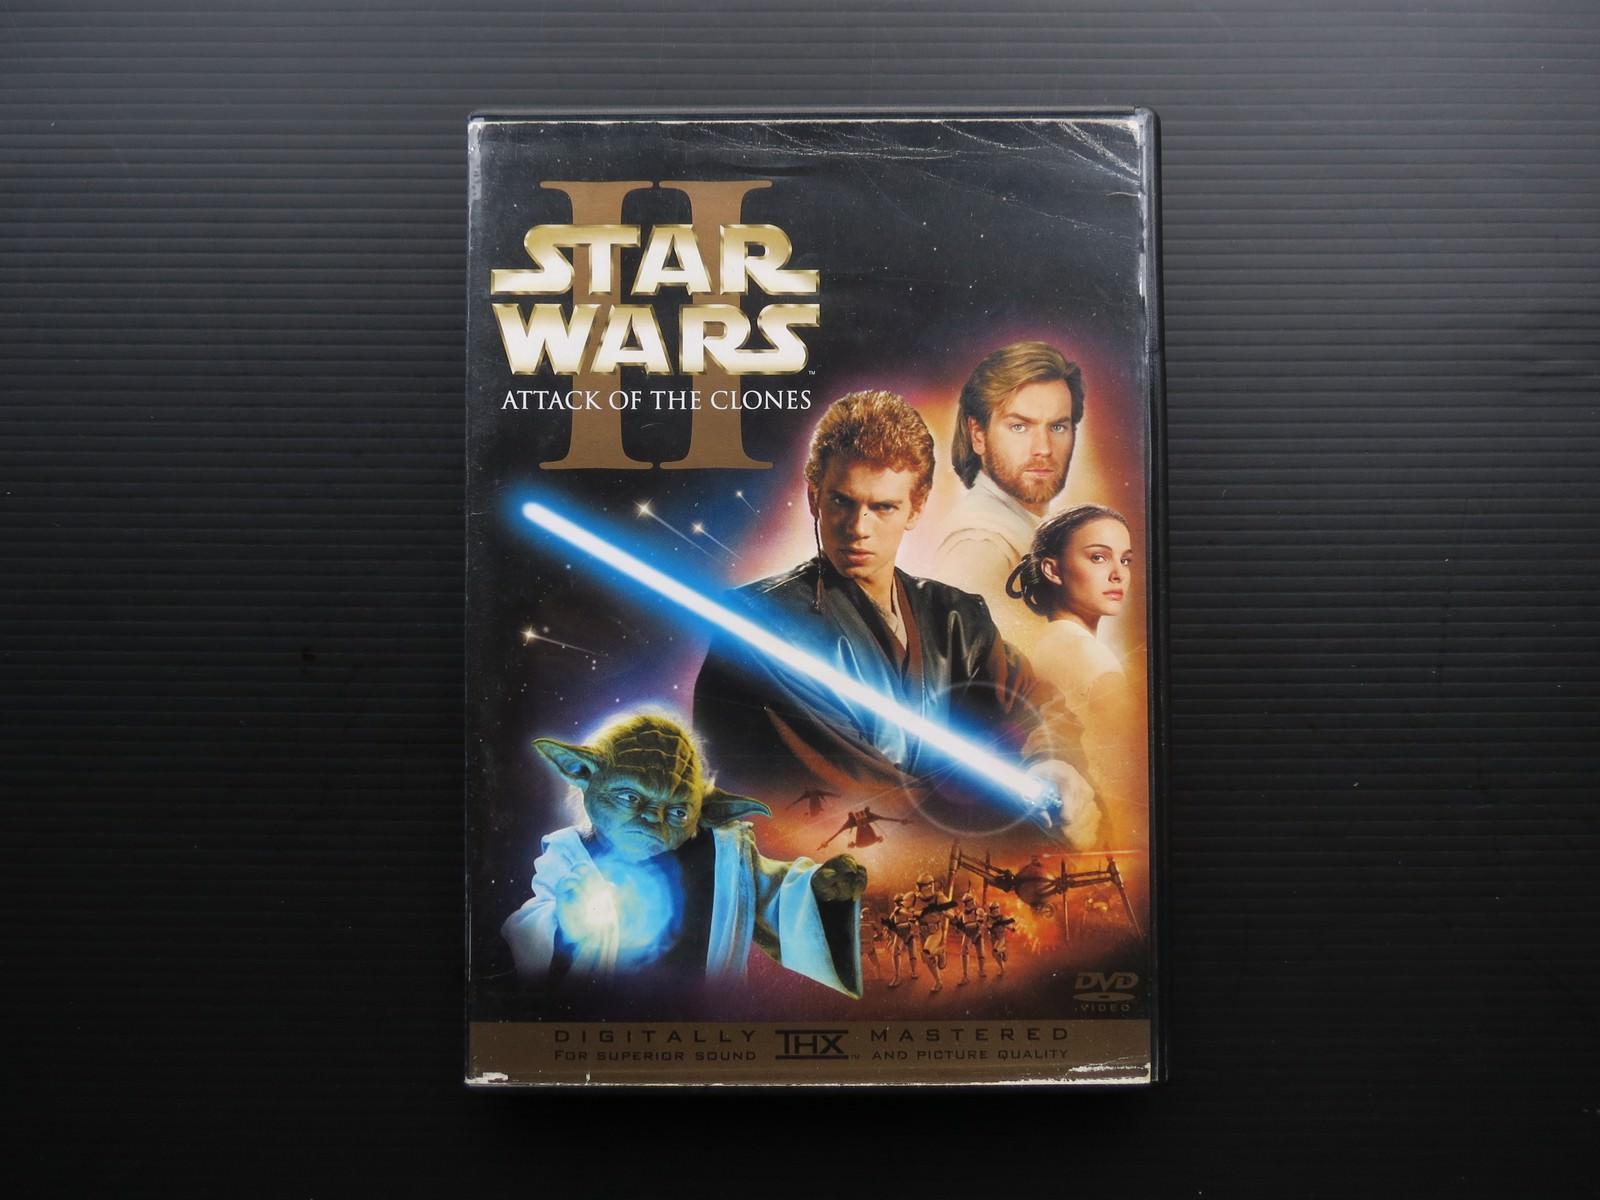 Movie, Star Wars Episode II: Attack of the Clones(美國, 2002) / 星際大戰二部曲:複製人全面進攻(台灣) / 星球大战前传:克隆人的进攻(中國) / 星球大戰前傳:複製人侵略(香港), 電影DVD